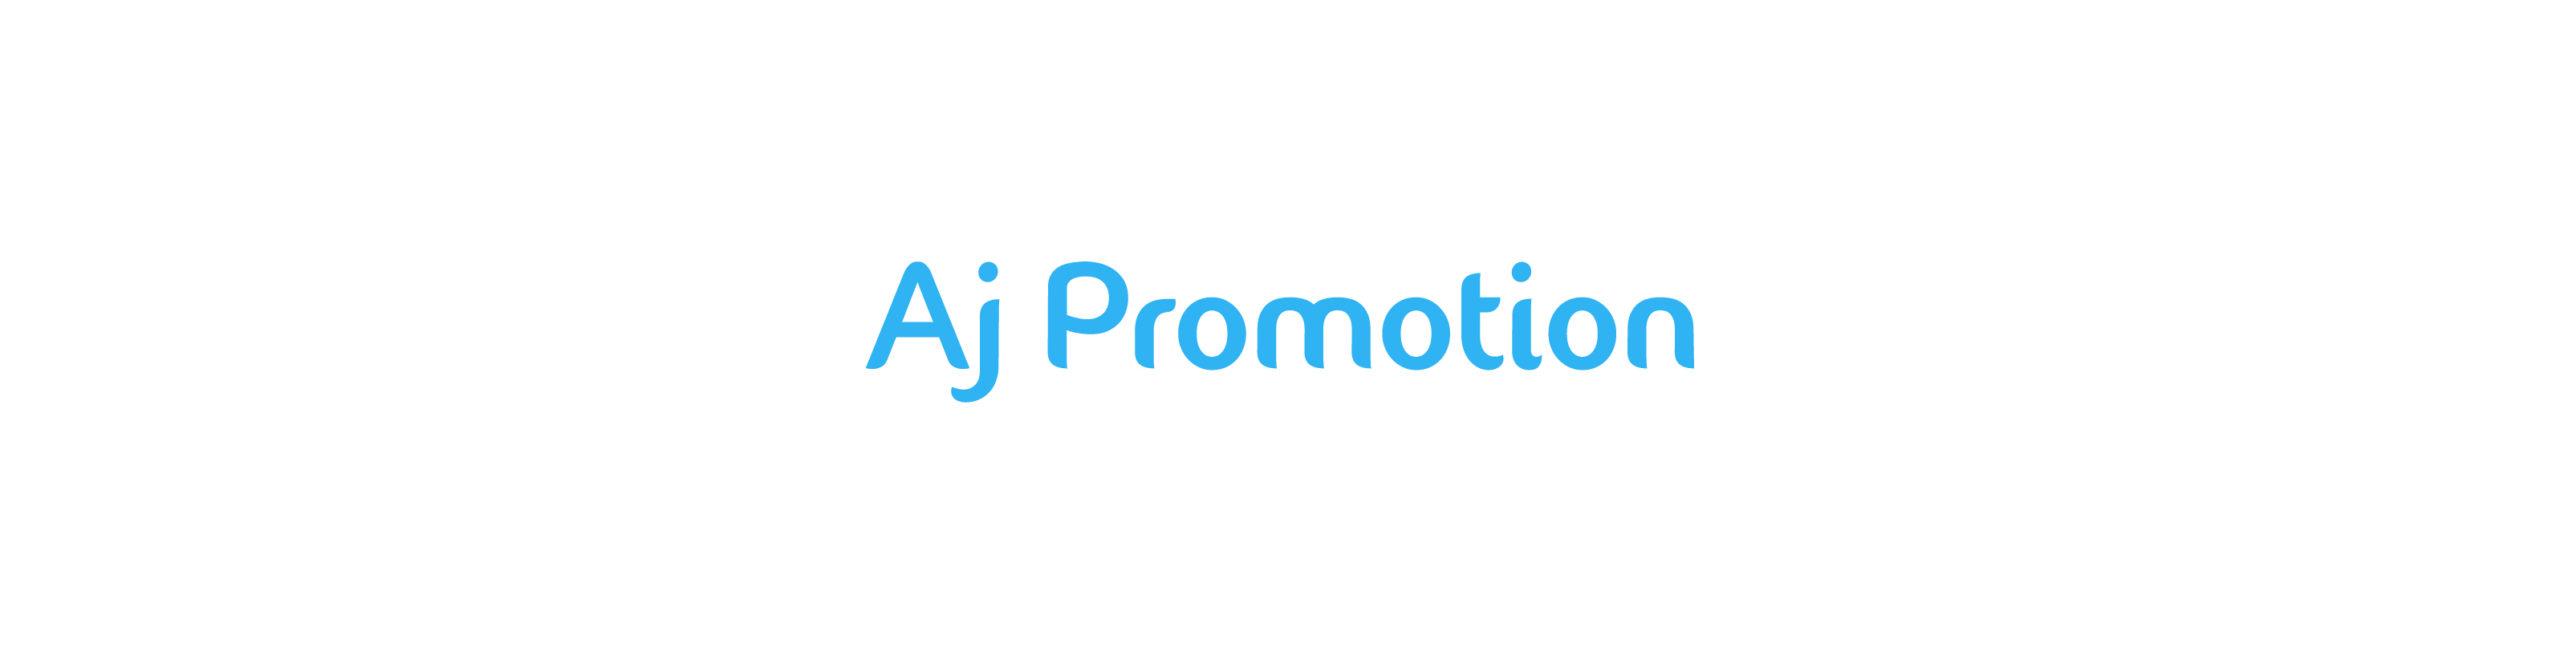 AJ Promotion logo